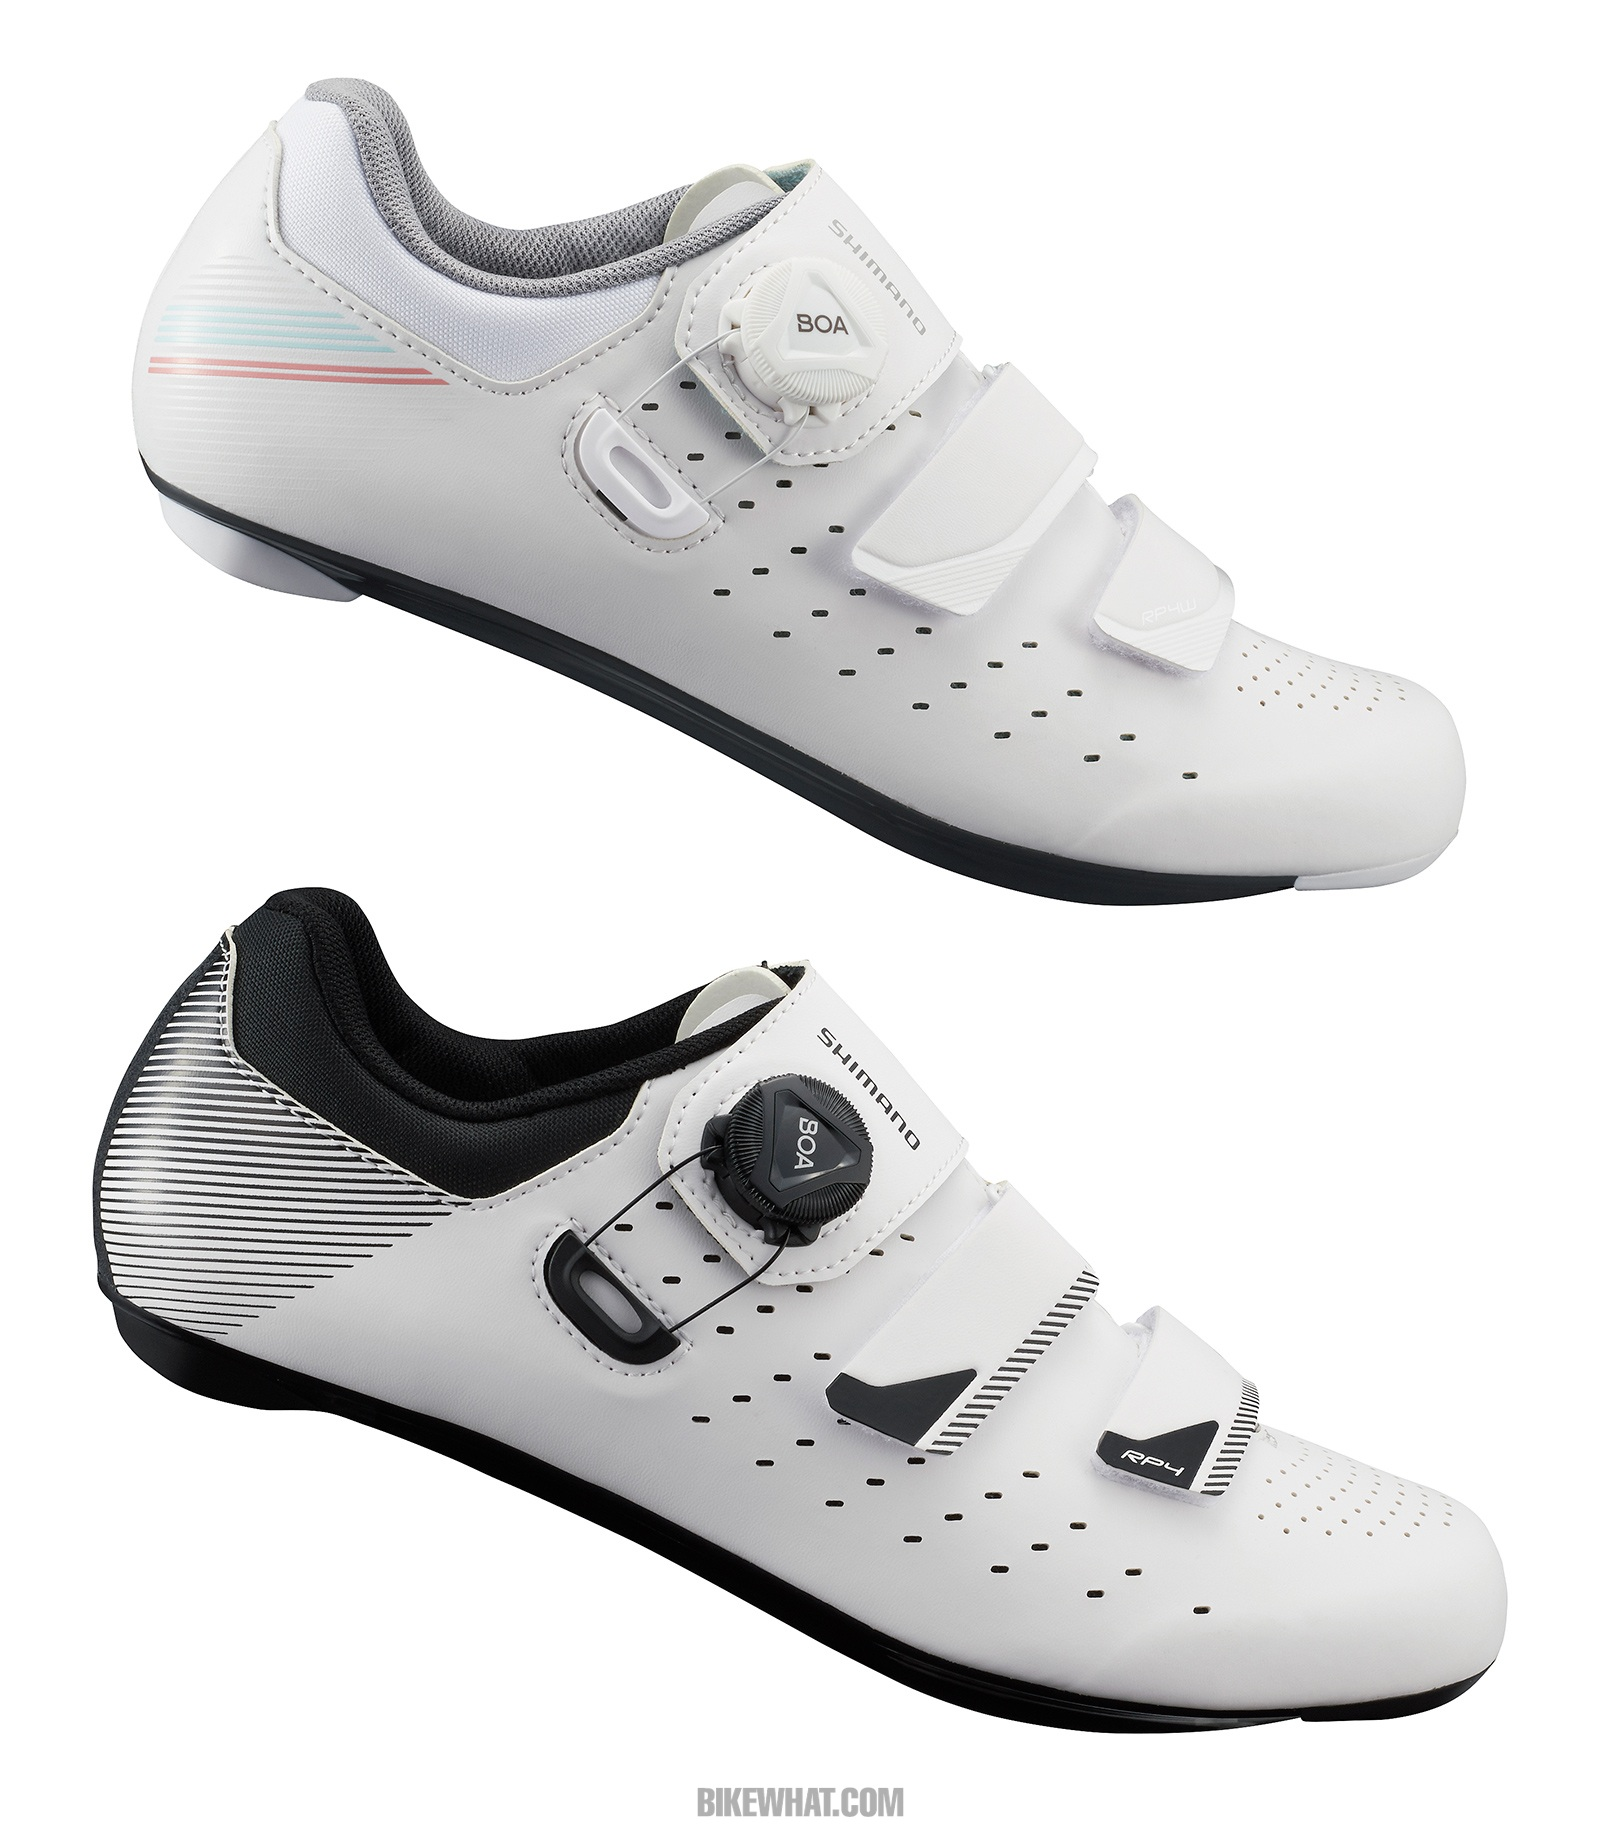 Shimano_Shoes_07.jpg